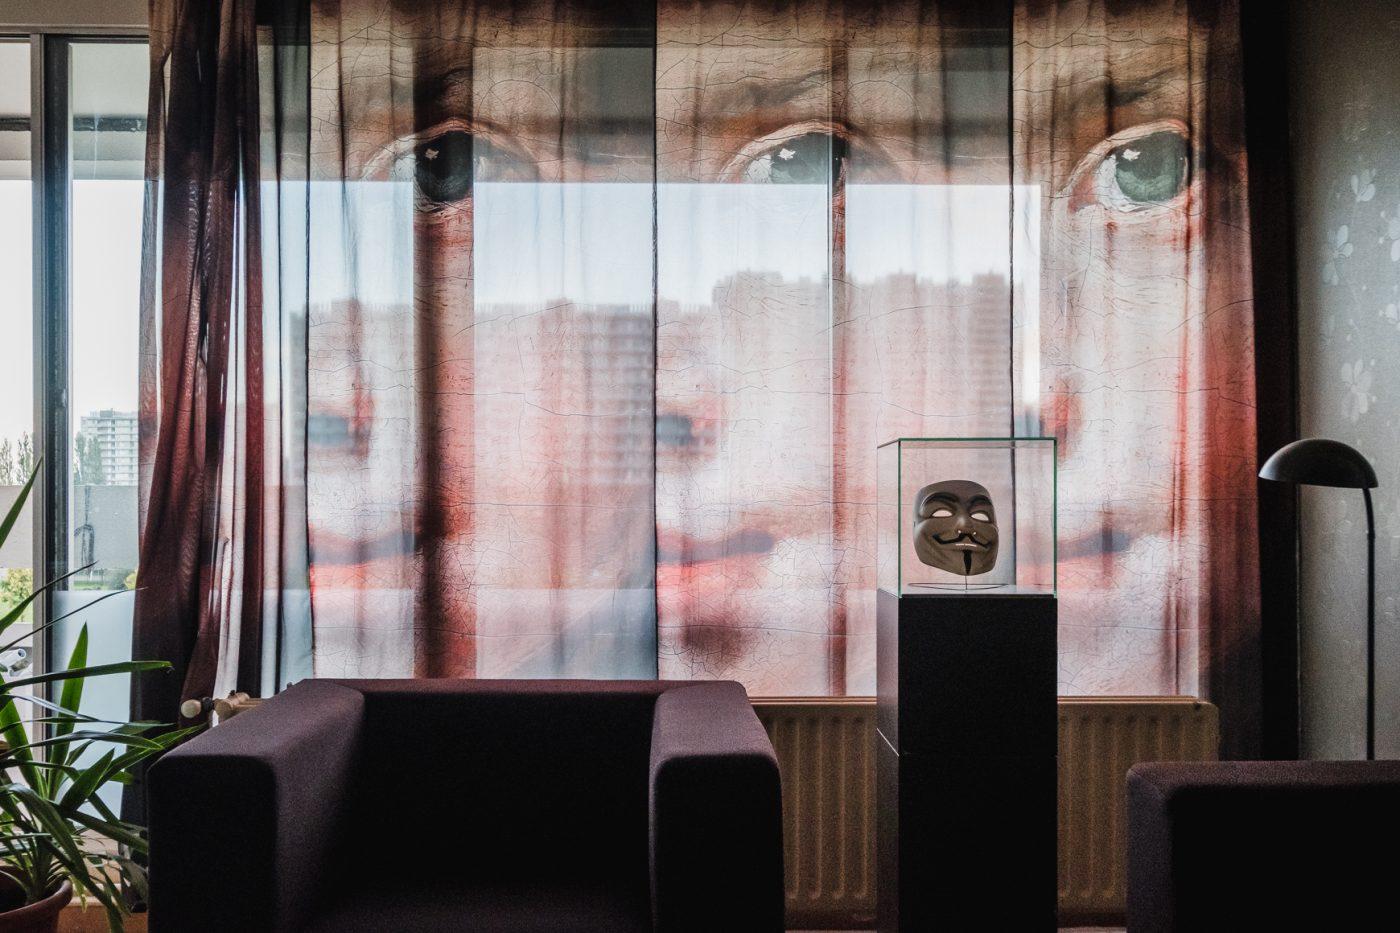 Interieur fotoreeks Europark appartementen Linkeroever